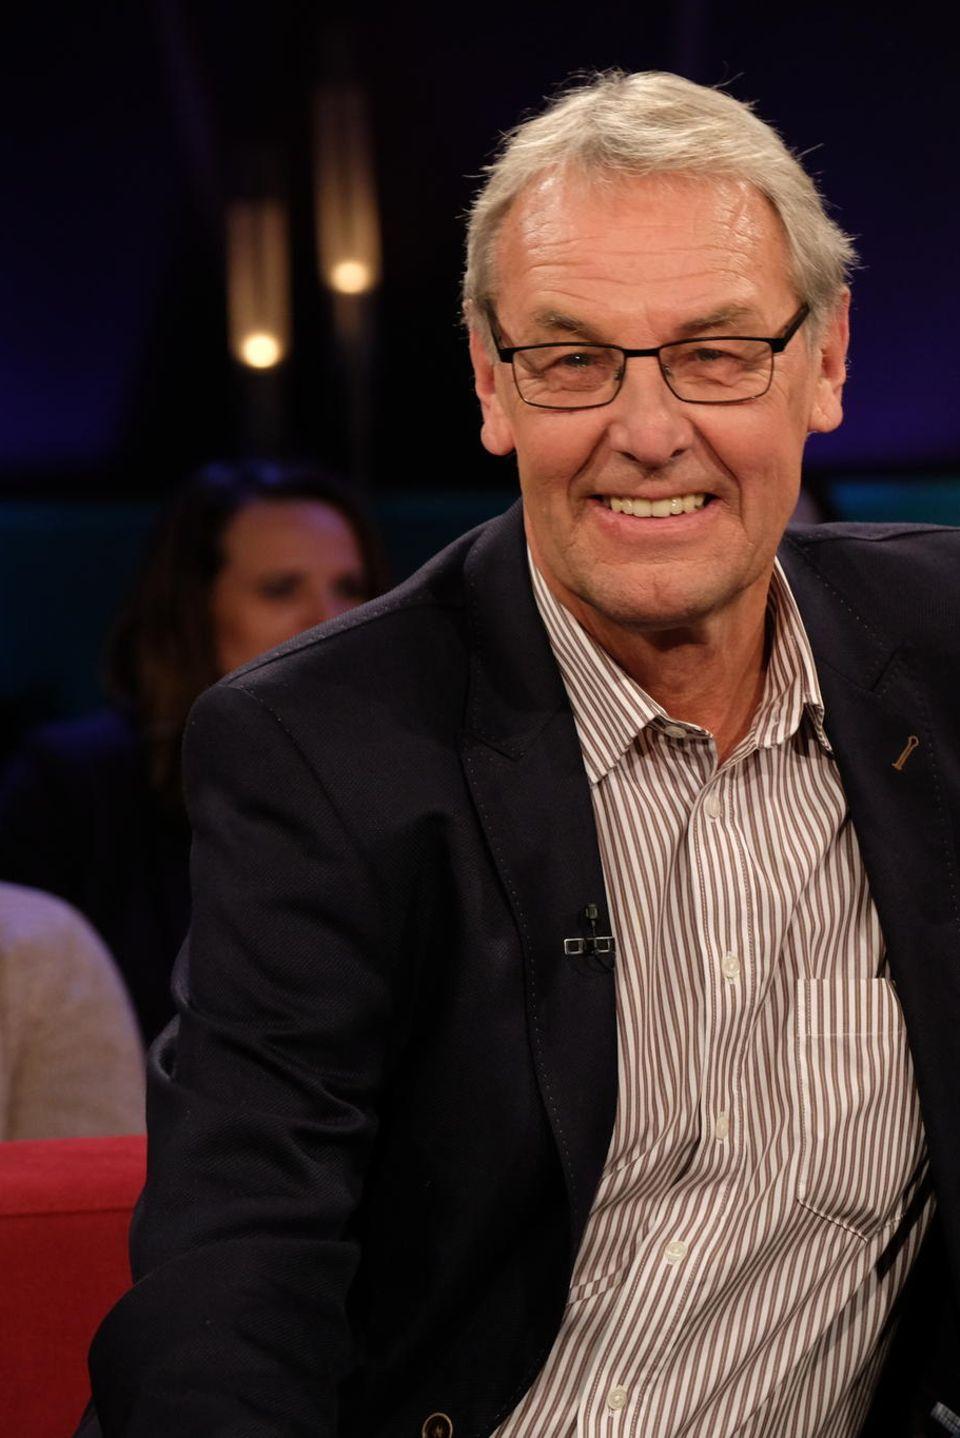 Jörg Wontorra, Laura Wontorra